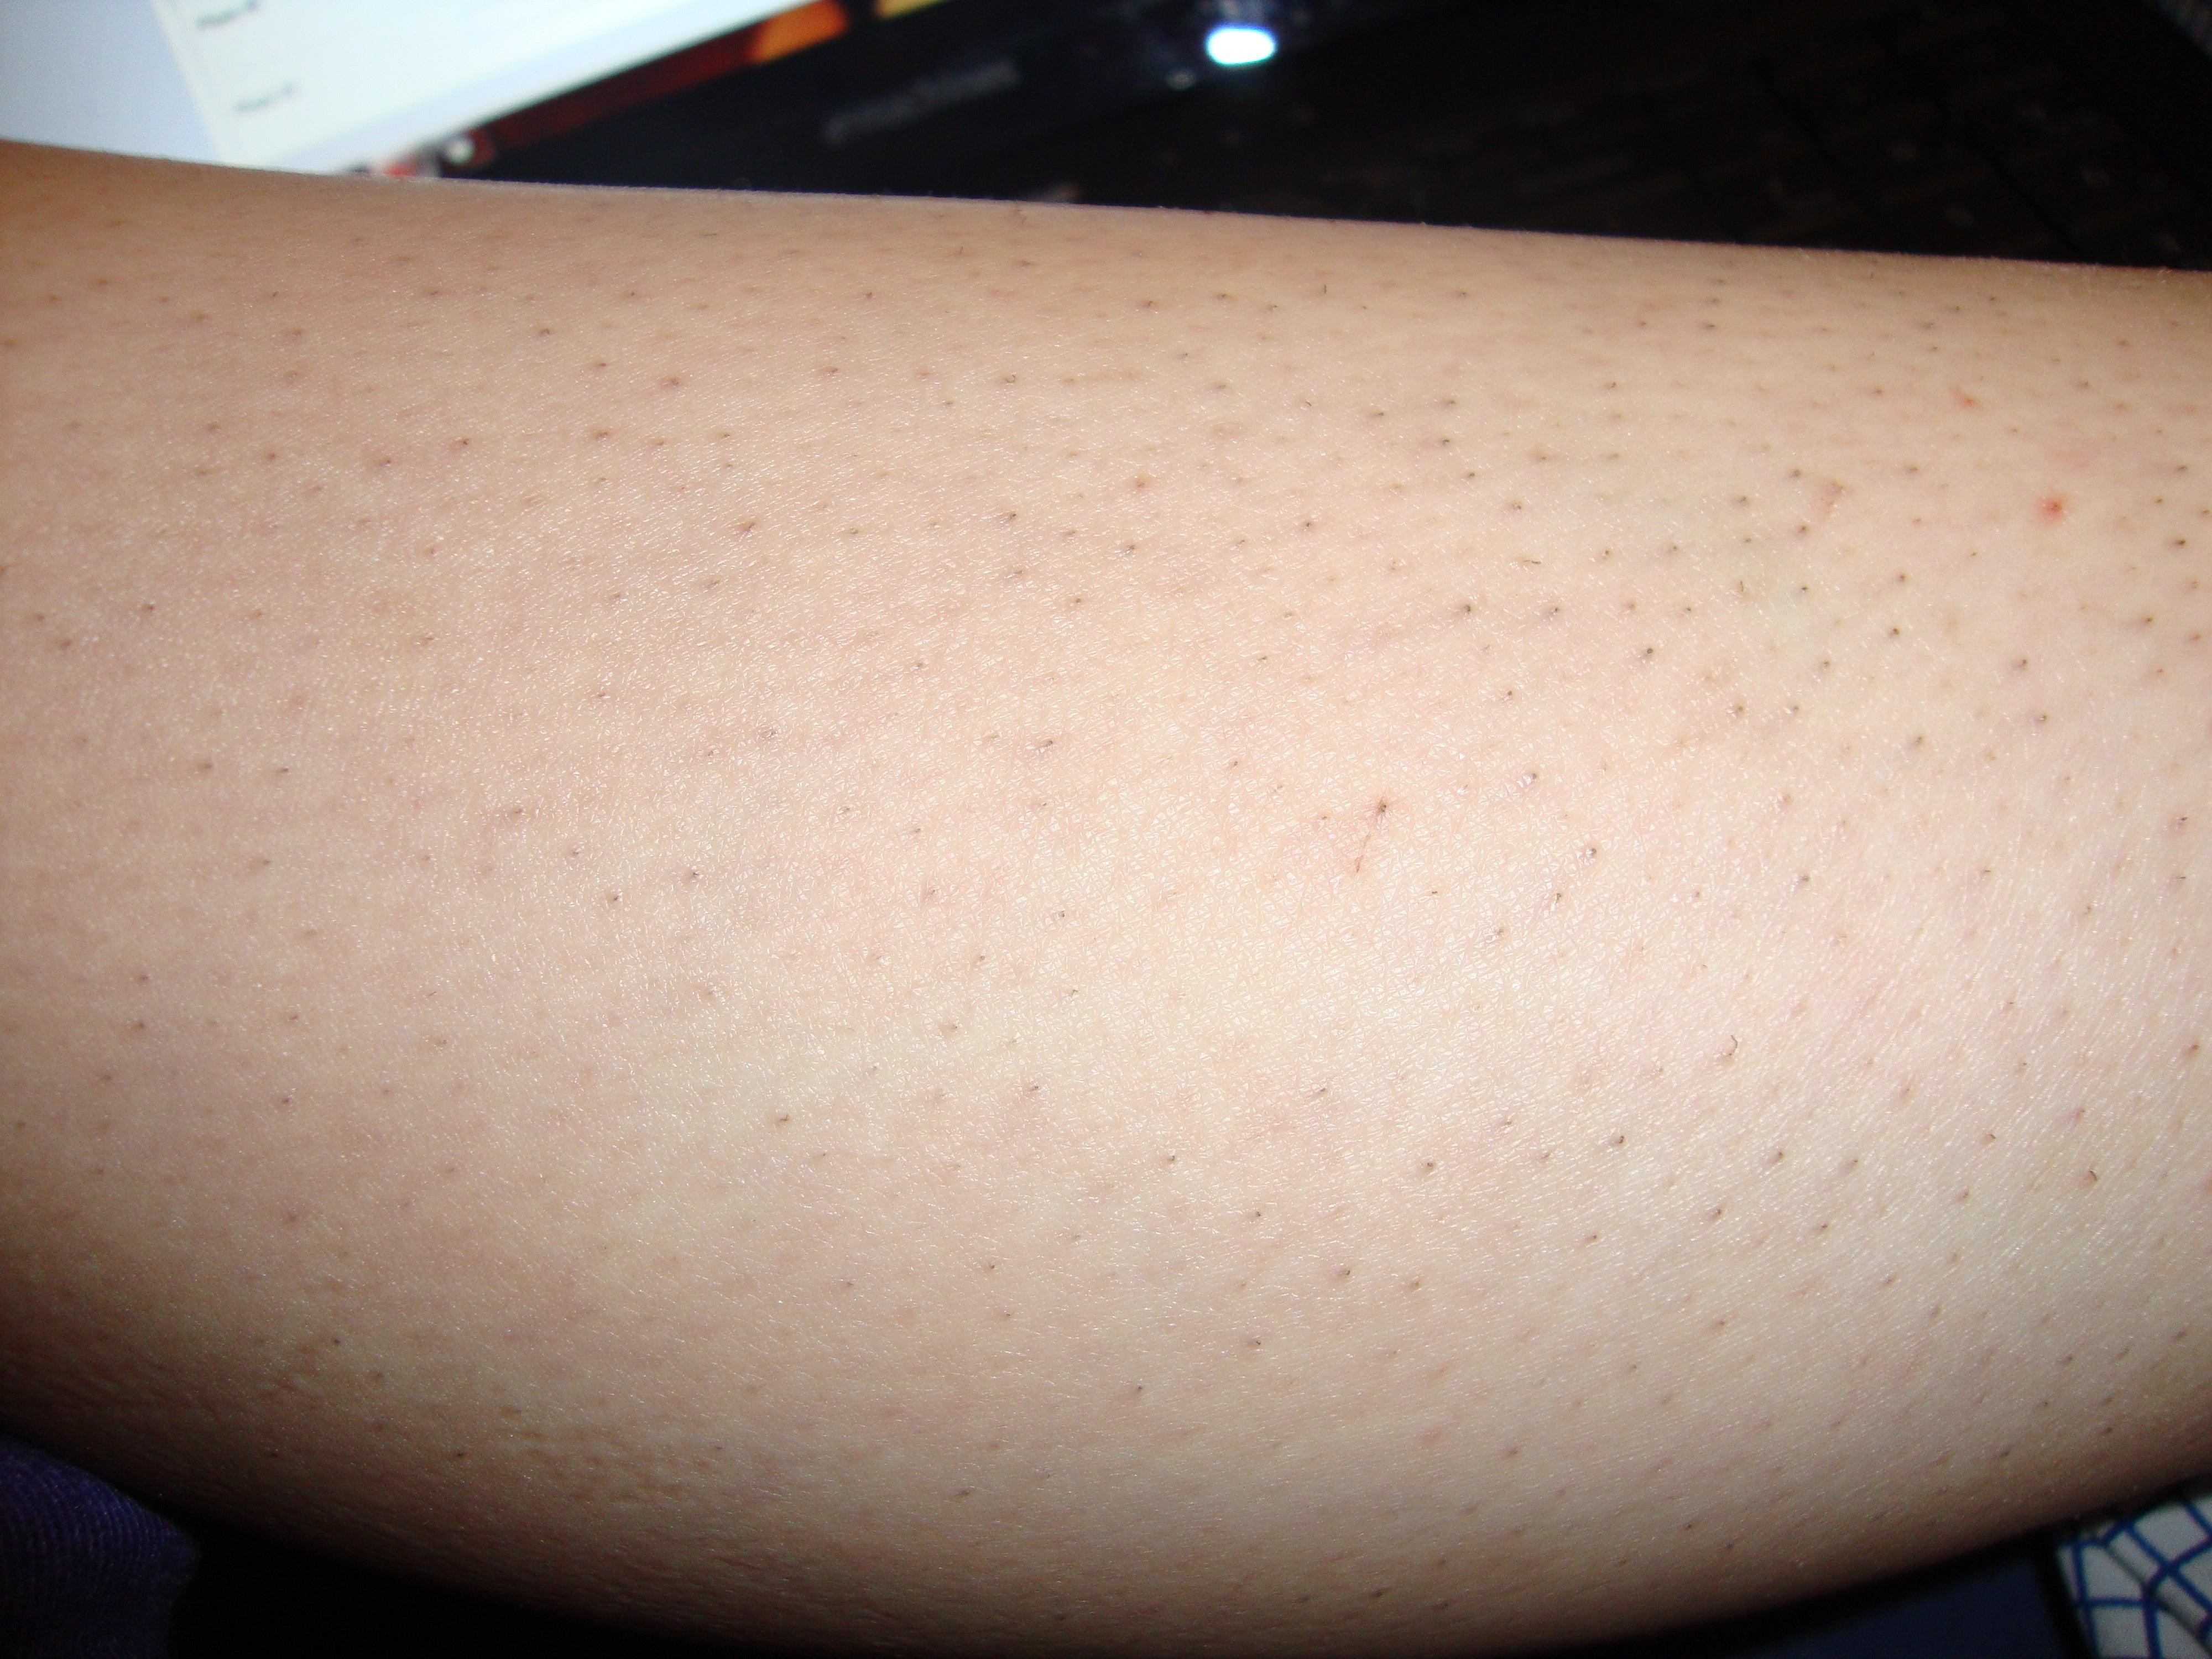 ingrown hair on inner thigh the gallery for gt ingrown